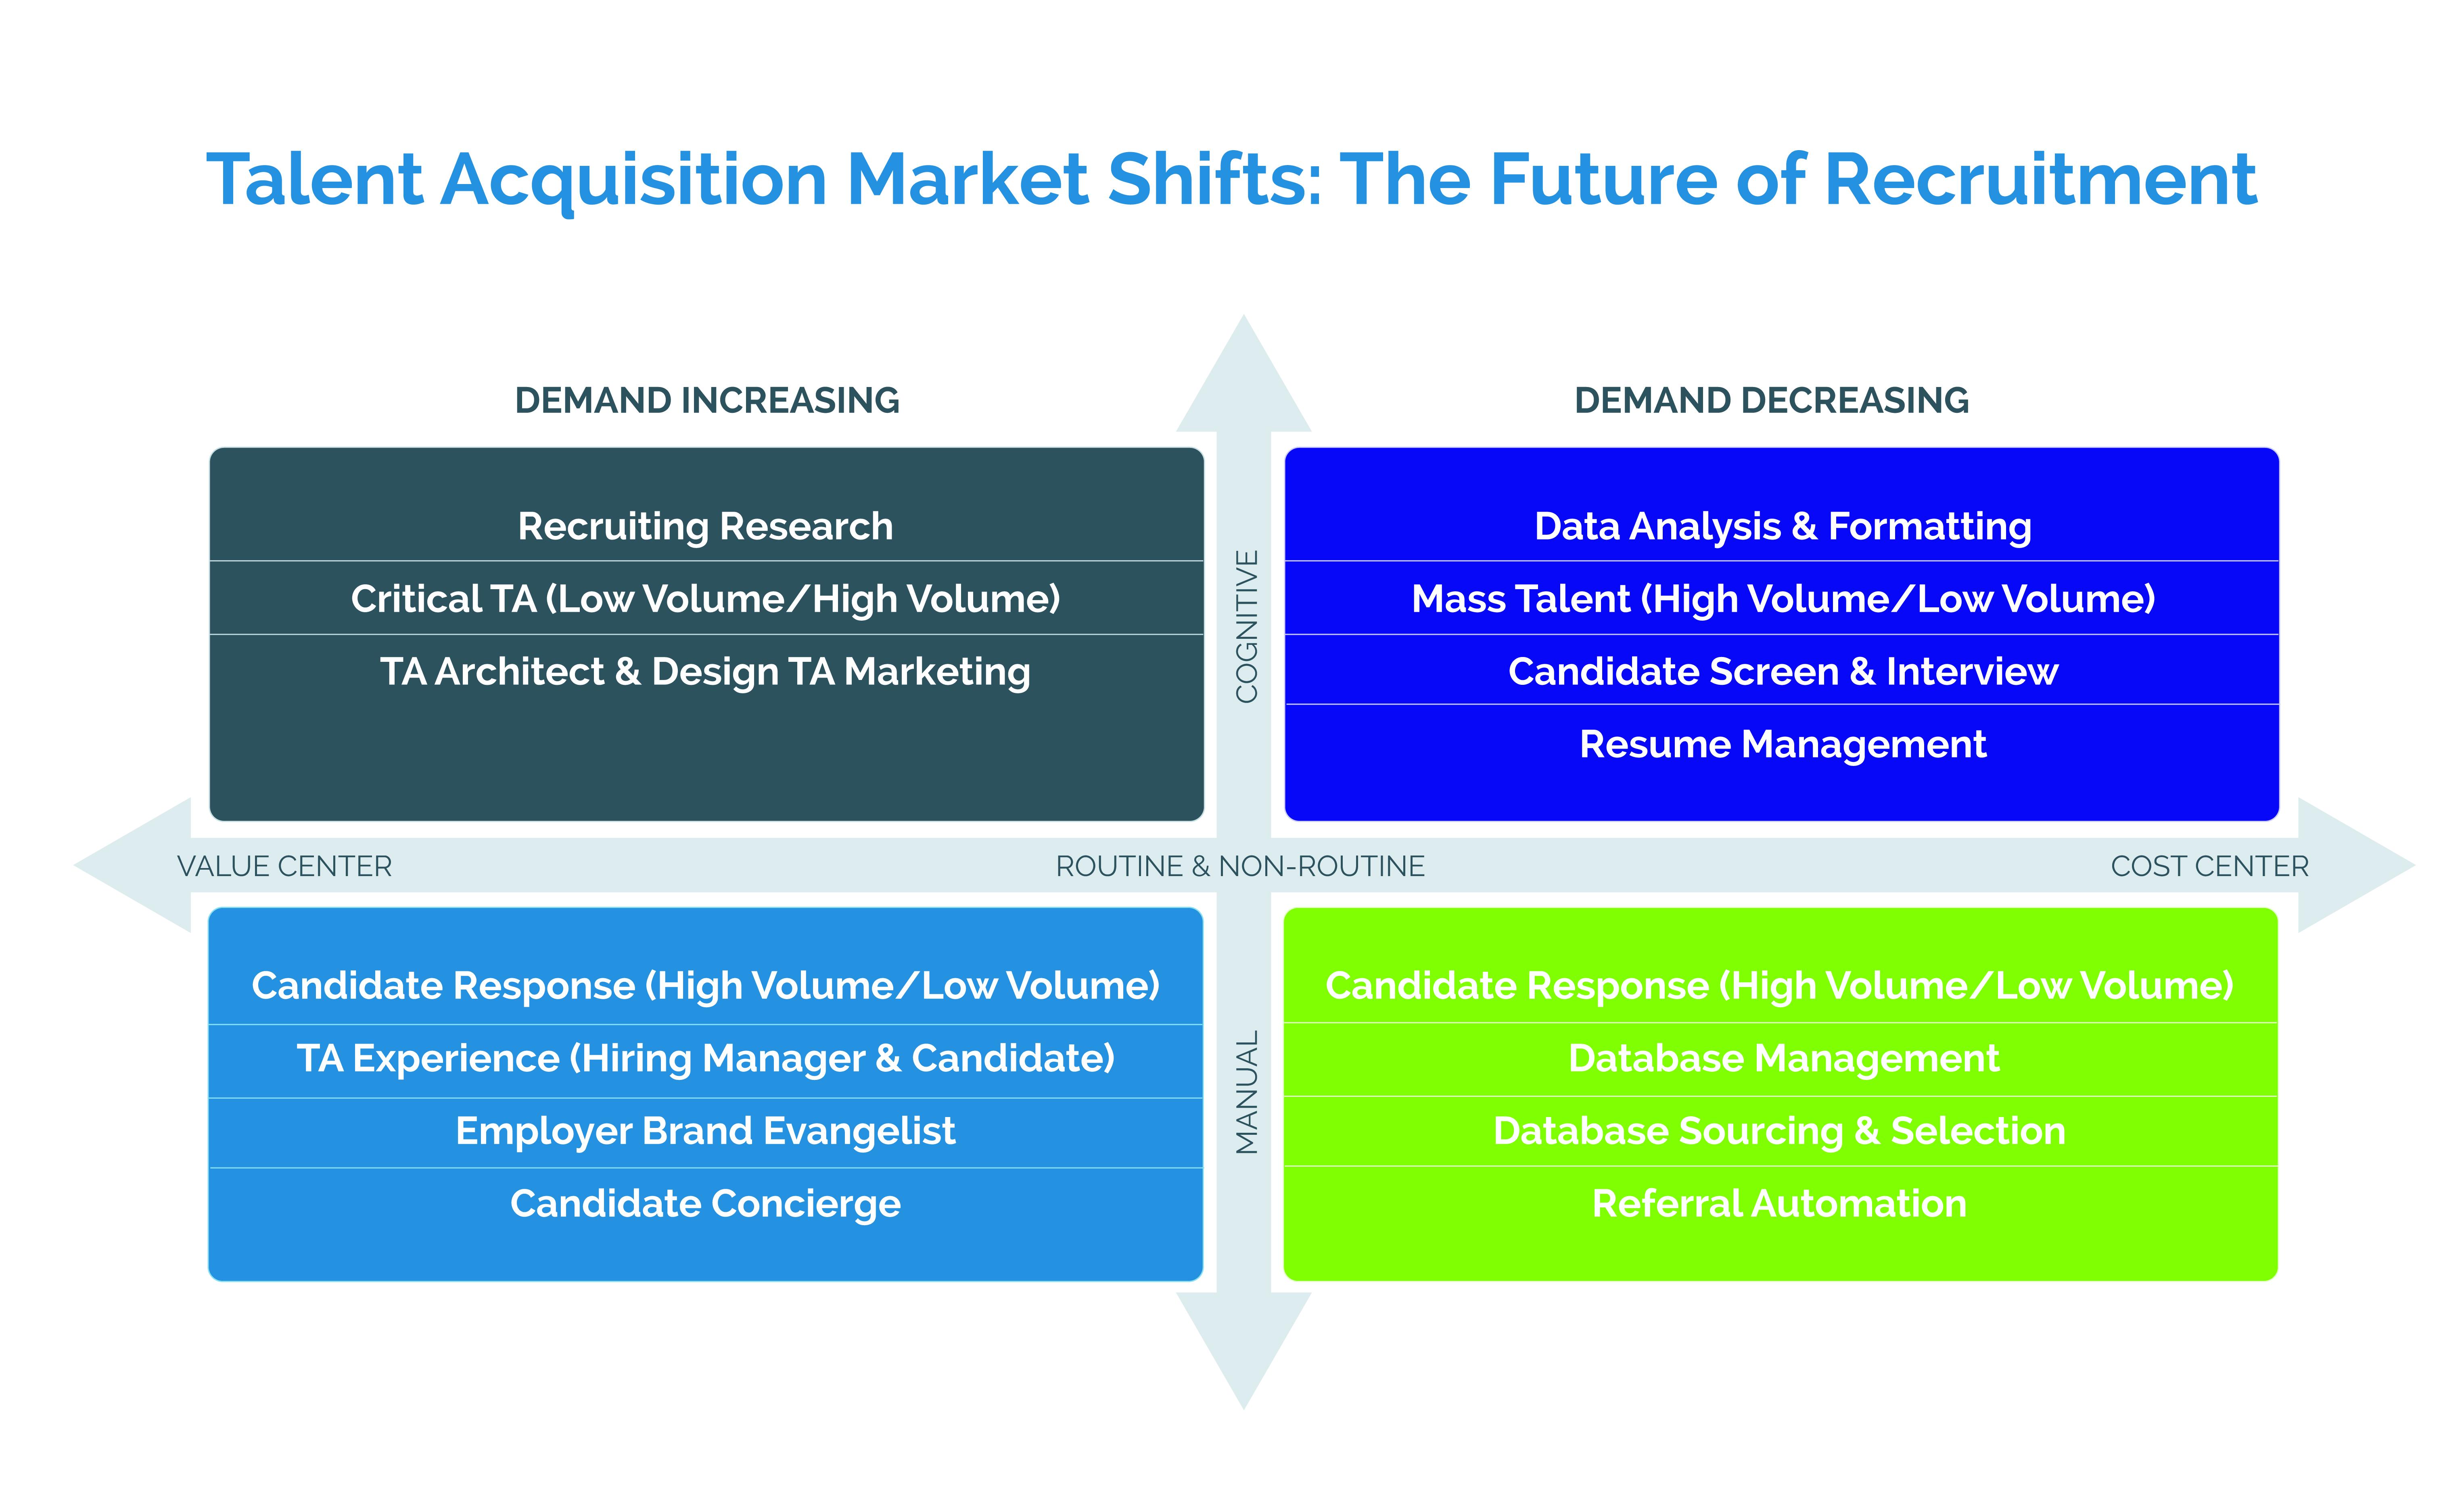 Talent Acquisition Market Shifts The Future of Recruitment@3x-100 (1)